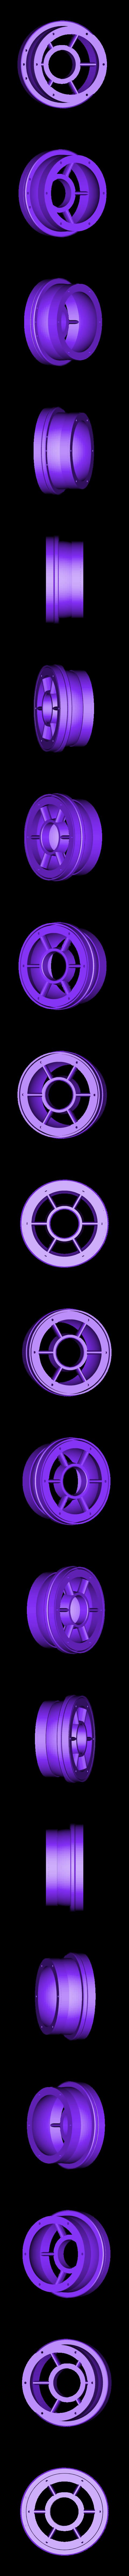 LPT-Exh-Case01ws.stl Download STL file Thrust Reverser with Turbofan Engine Nacelle • 3D printable model, konchan77